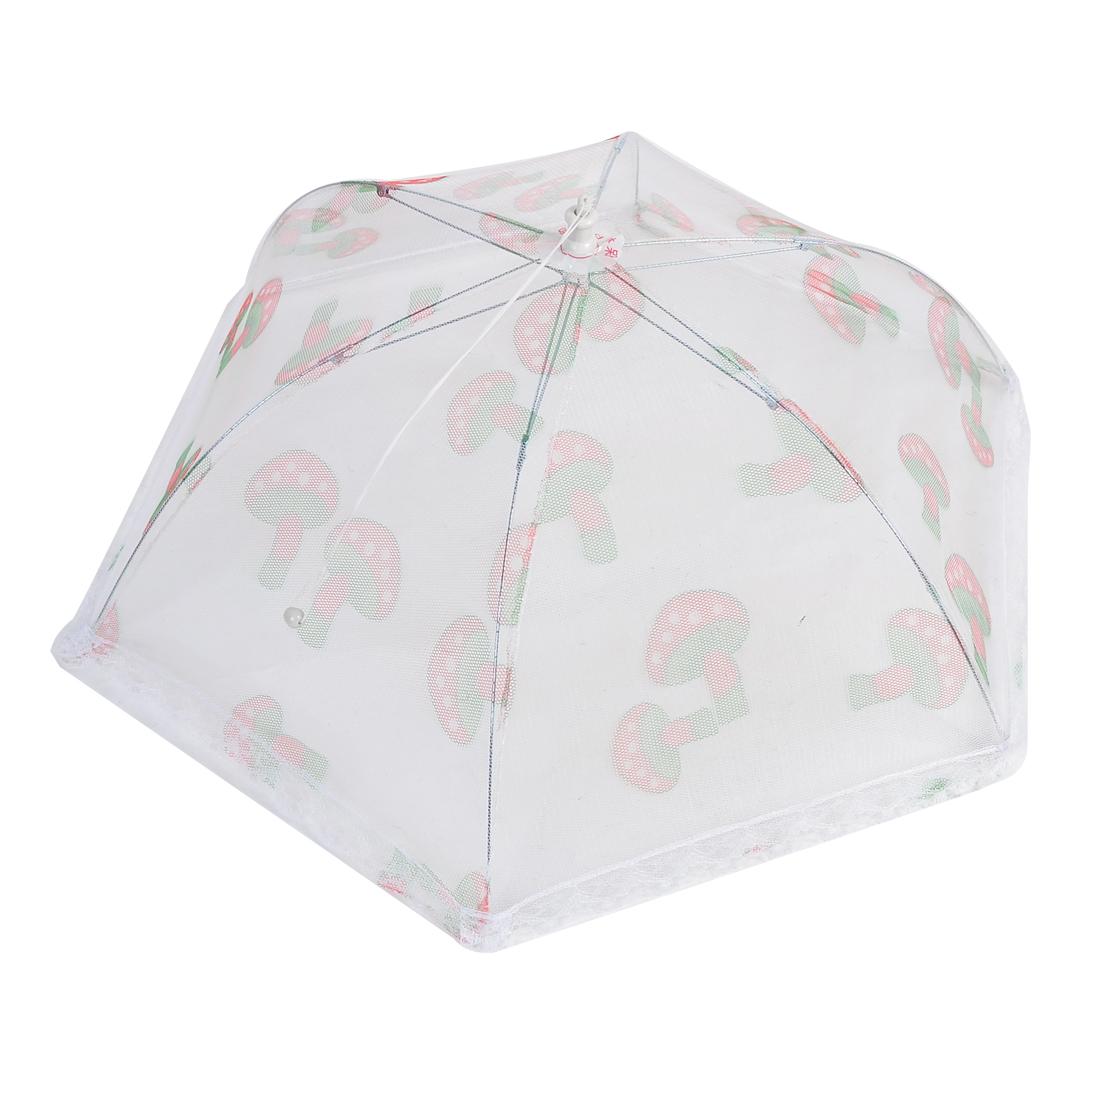 Red Green Mushroom Pattern Lace Hem Nylon Mesh Folding Food Cover Umbrella